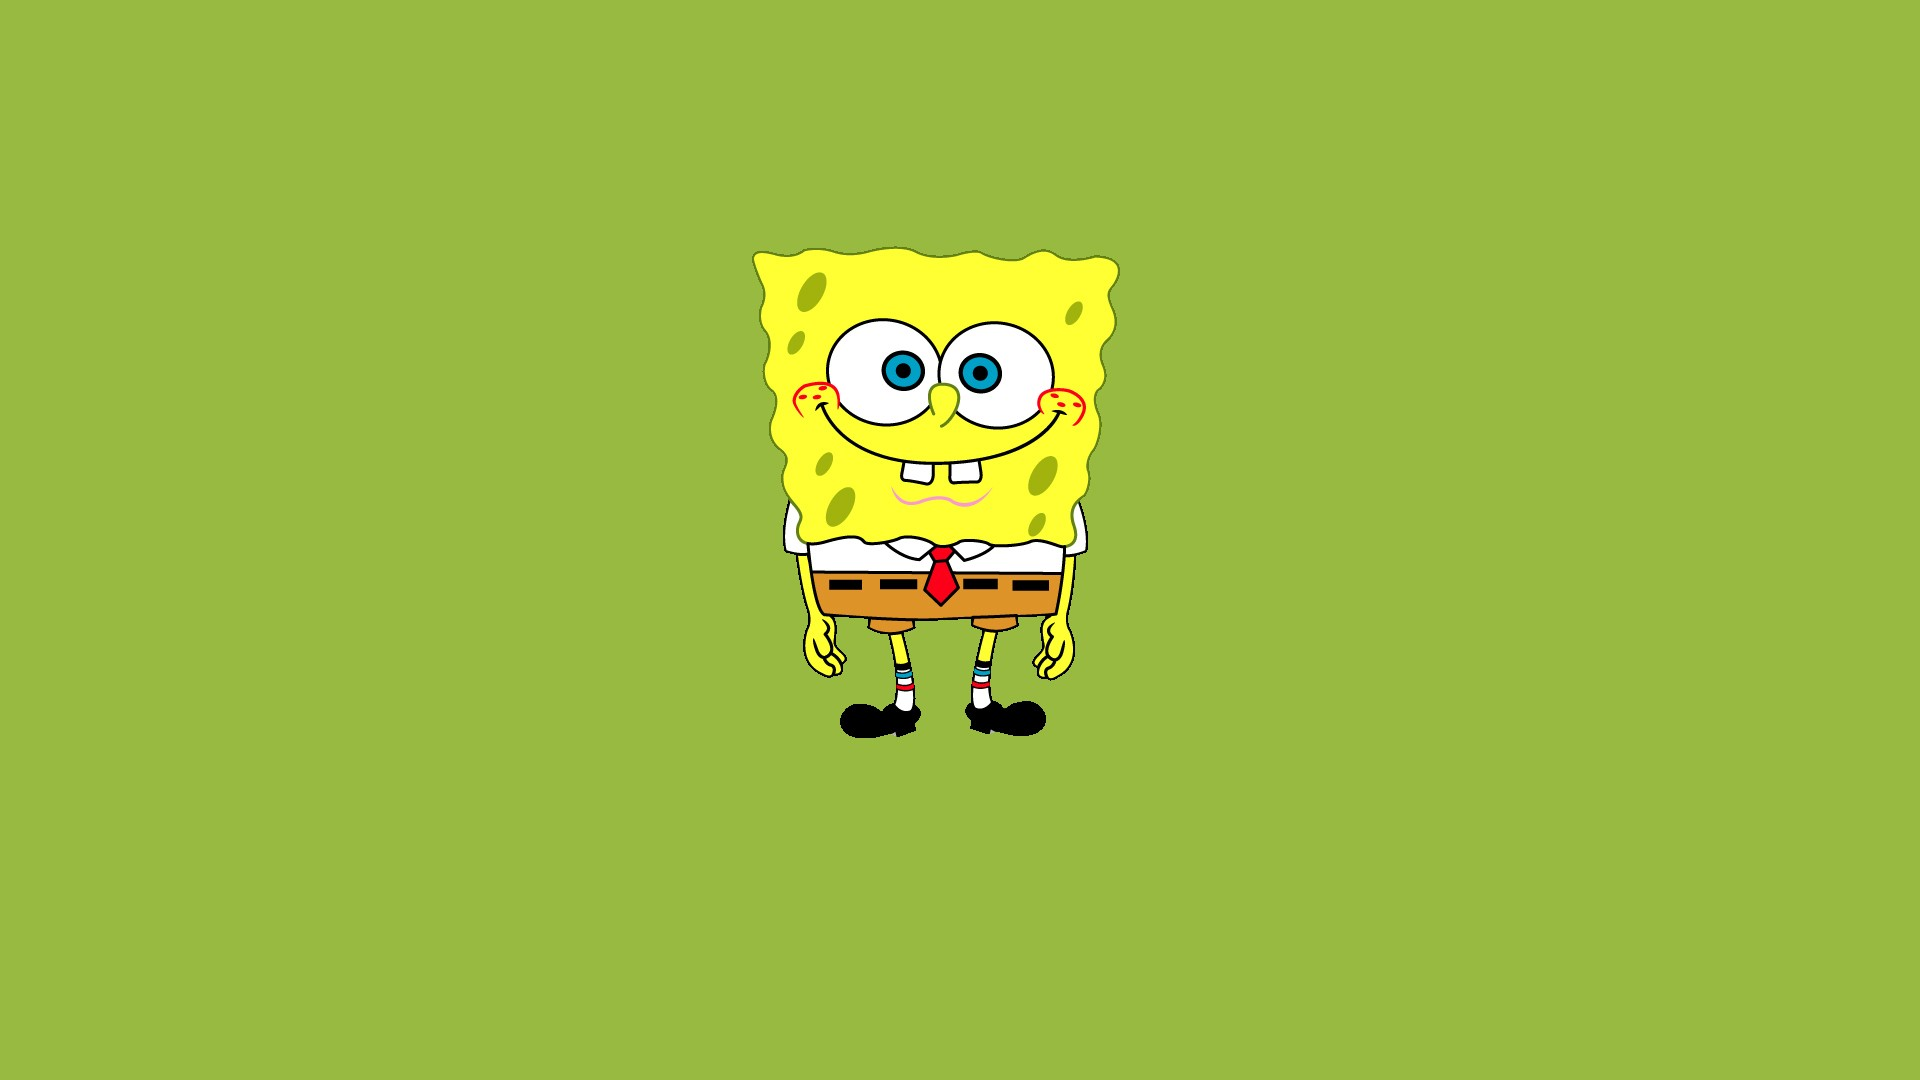 spongebob 15623 1920x1080 px